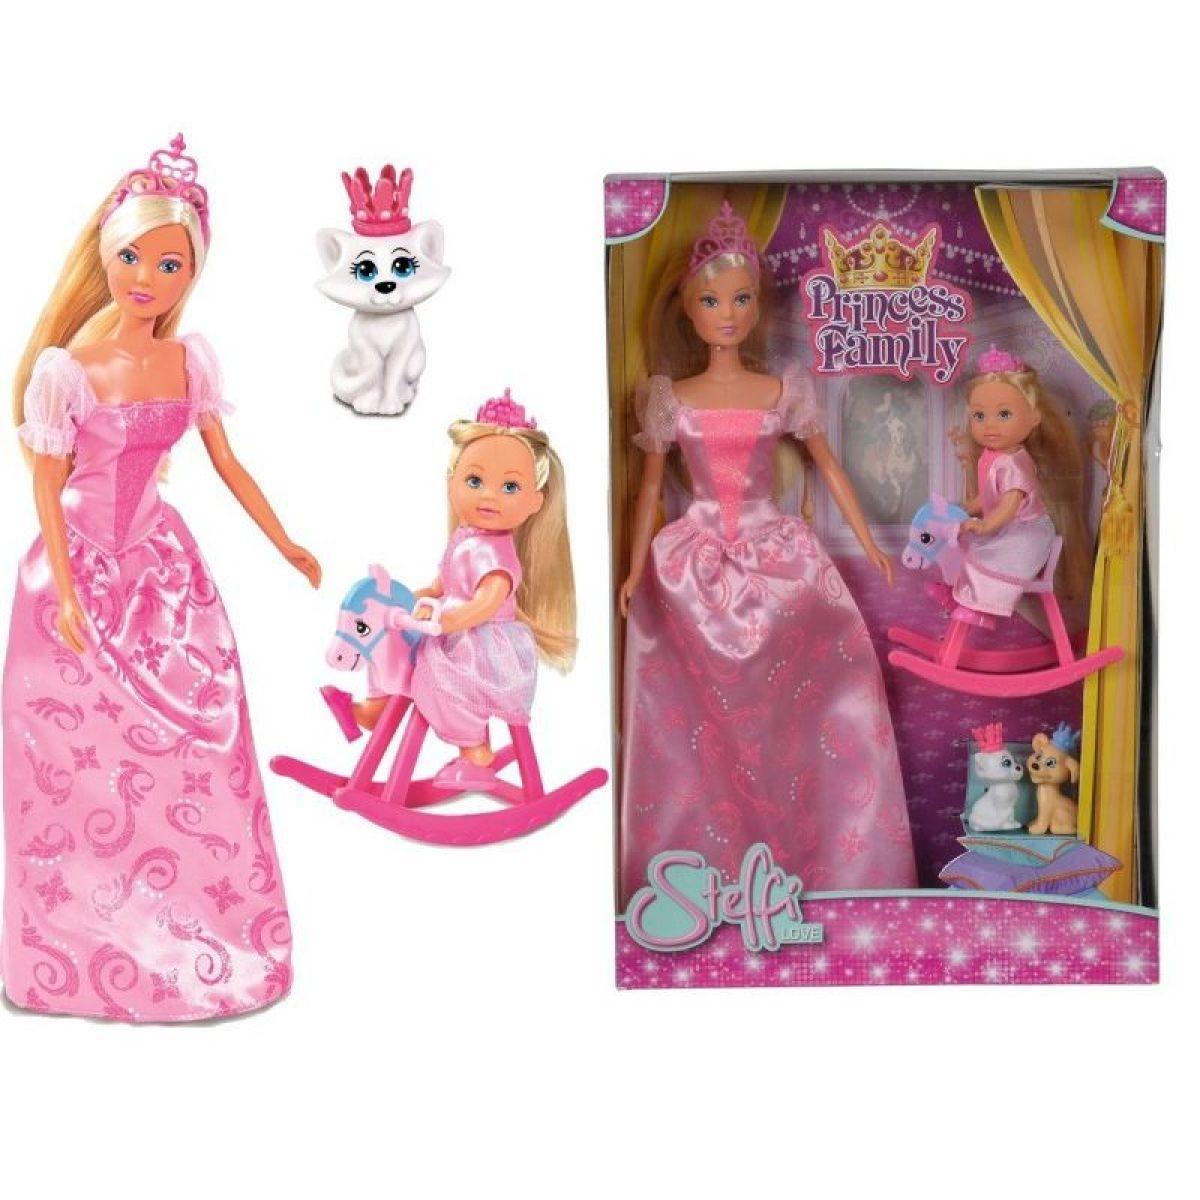 Steffi Love Panenka Princess Family